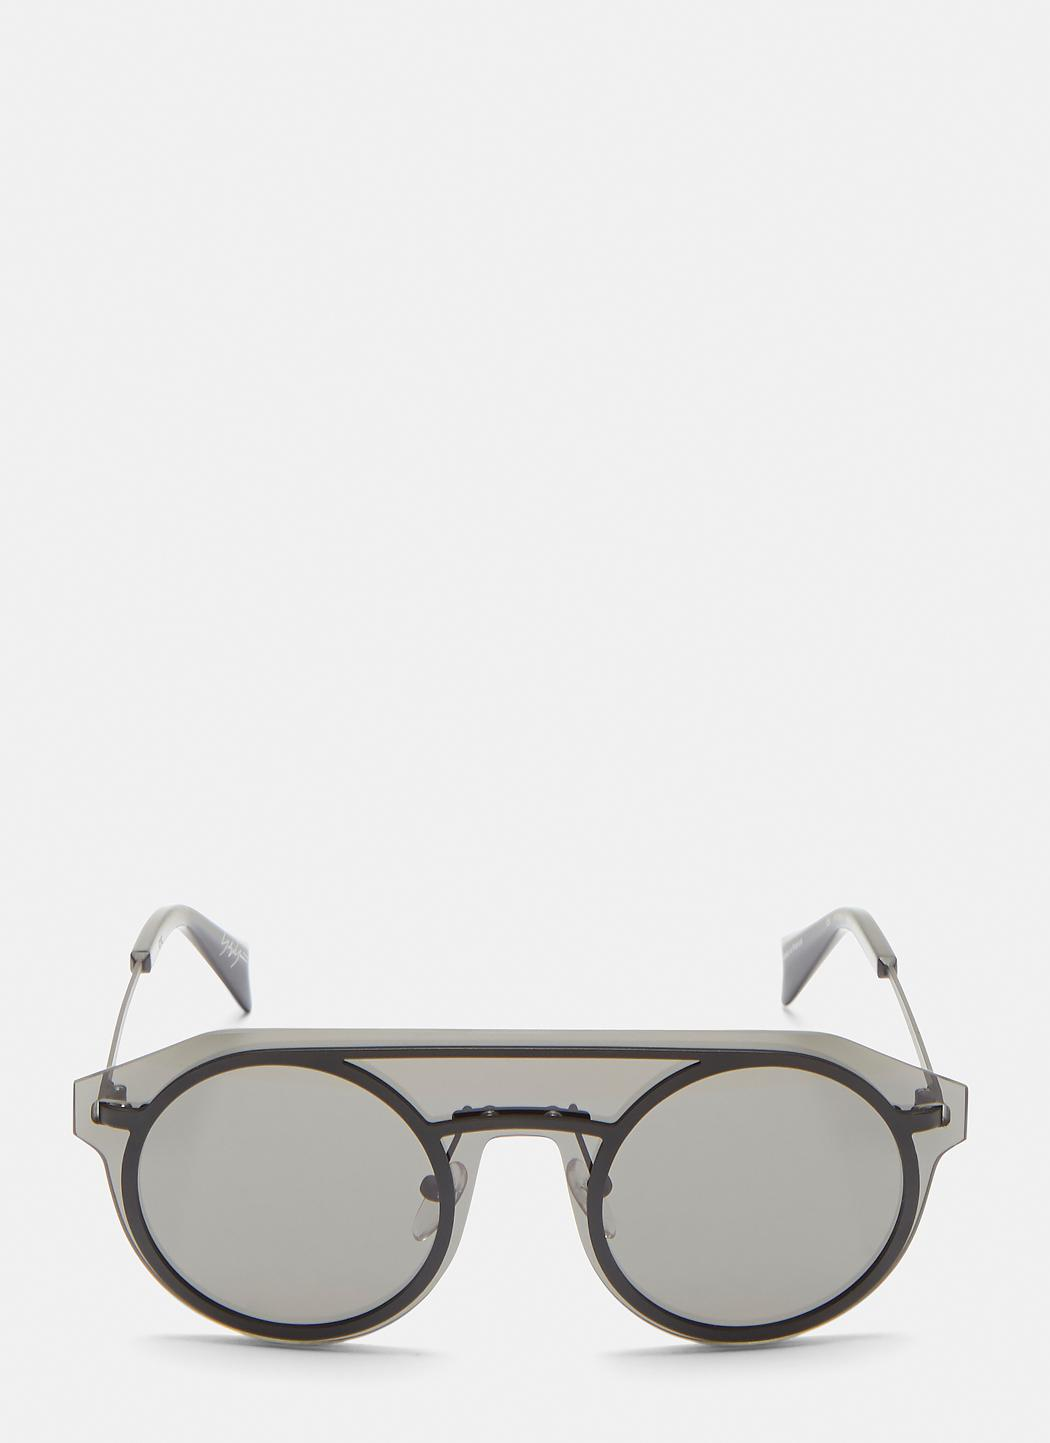 090580f3b34 Yohji Yamamoto Yy7013 Sheer Acetate Sunglasses In Black in Black for ...